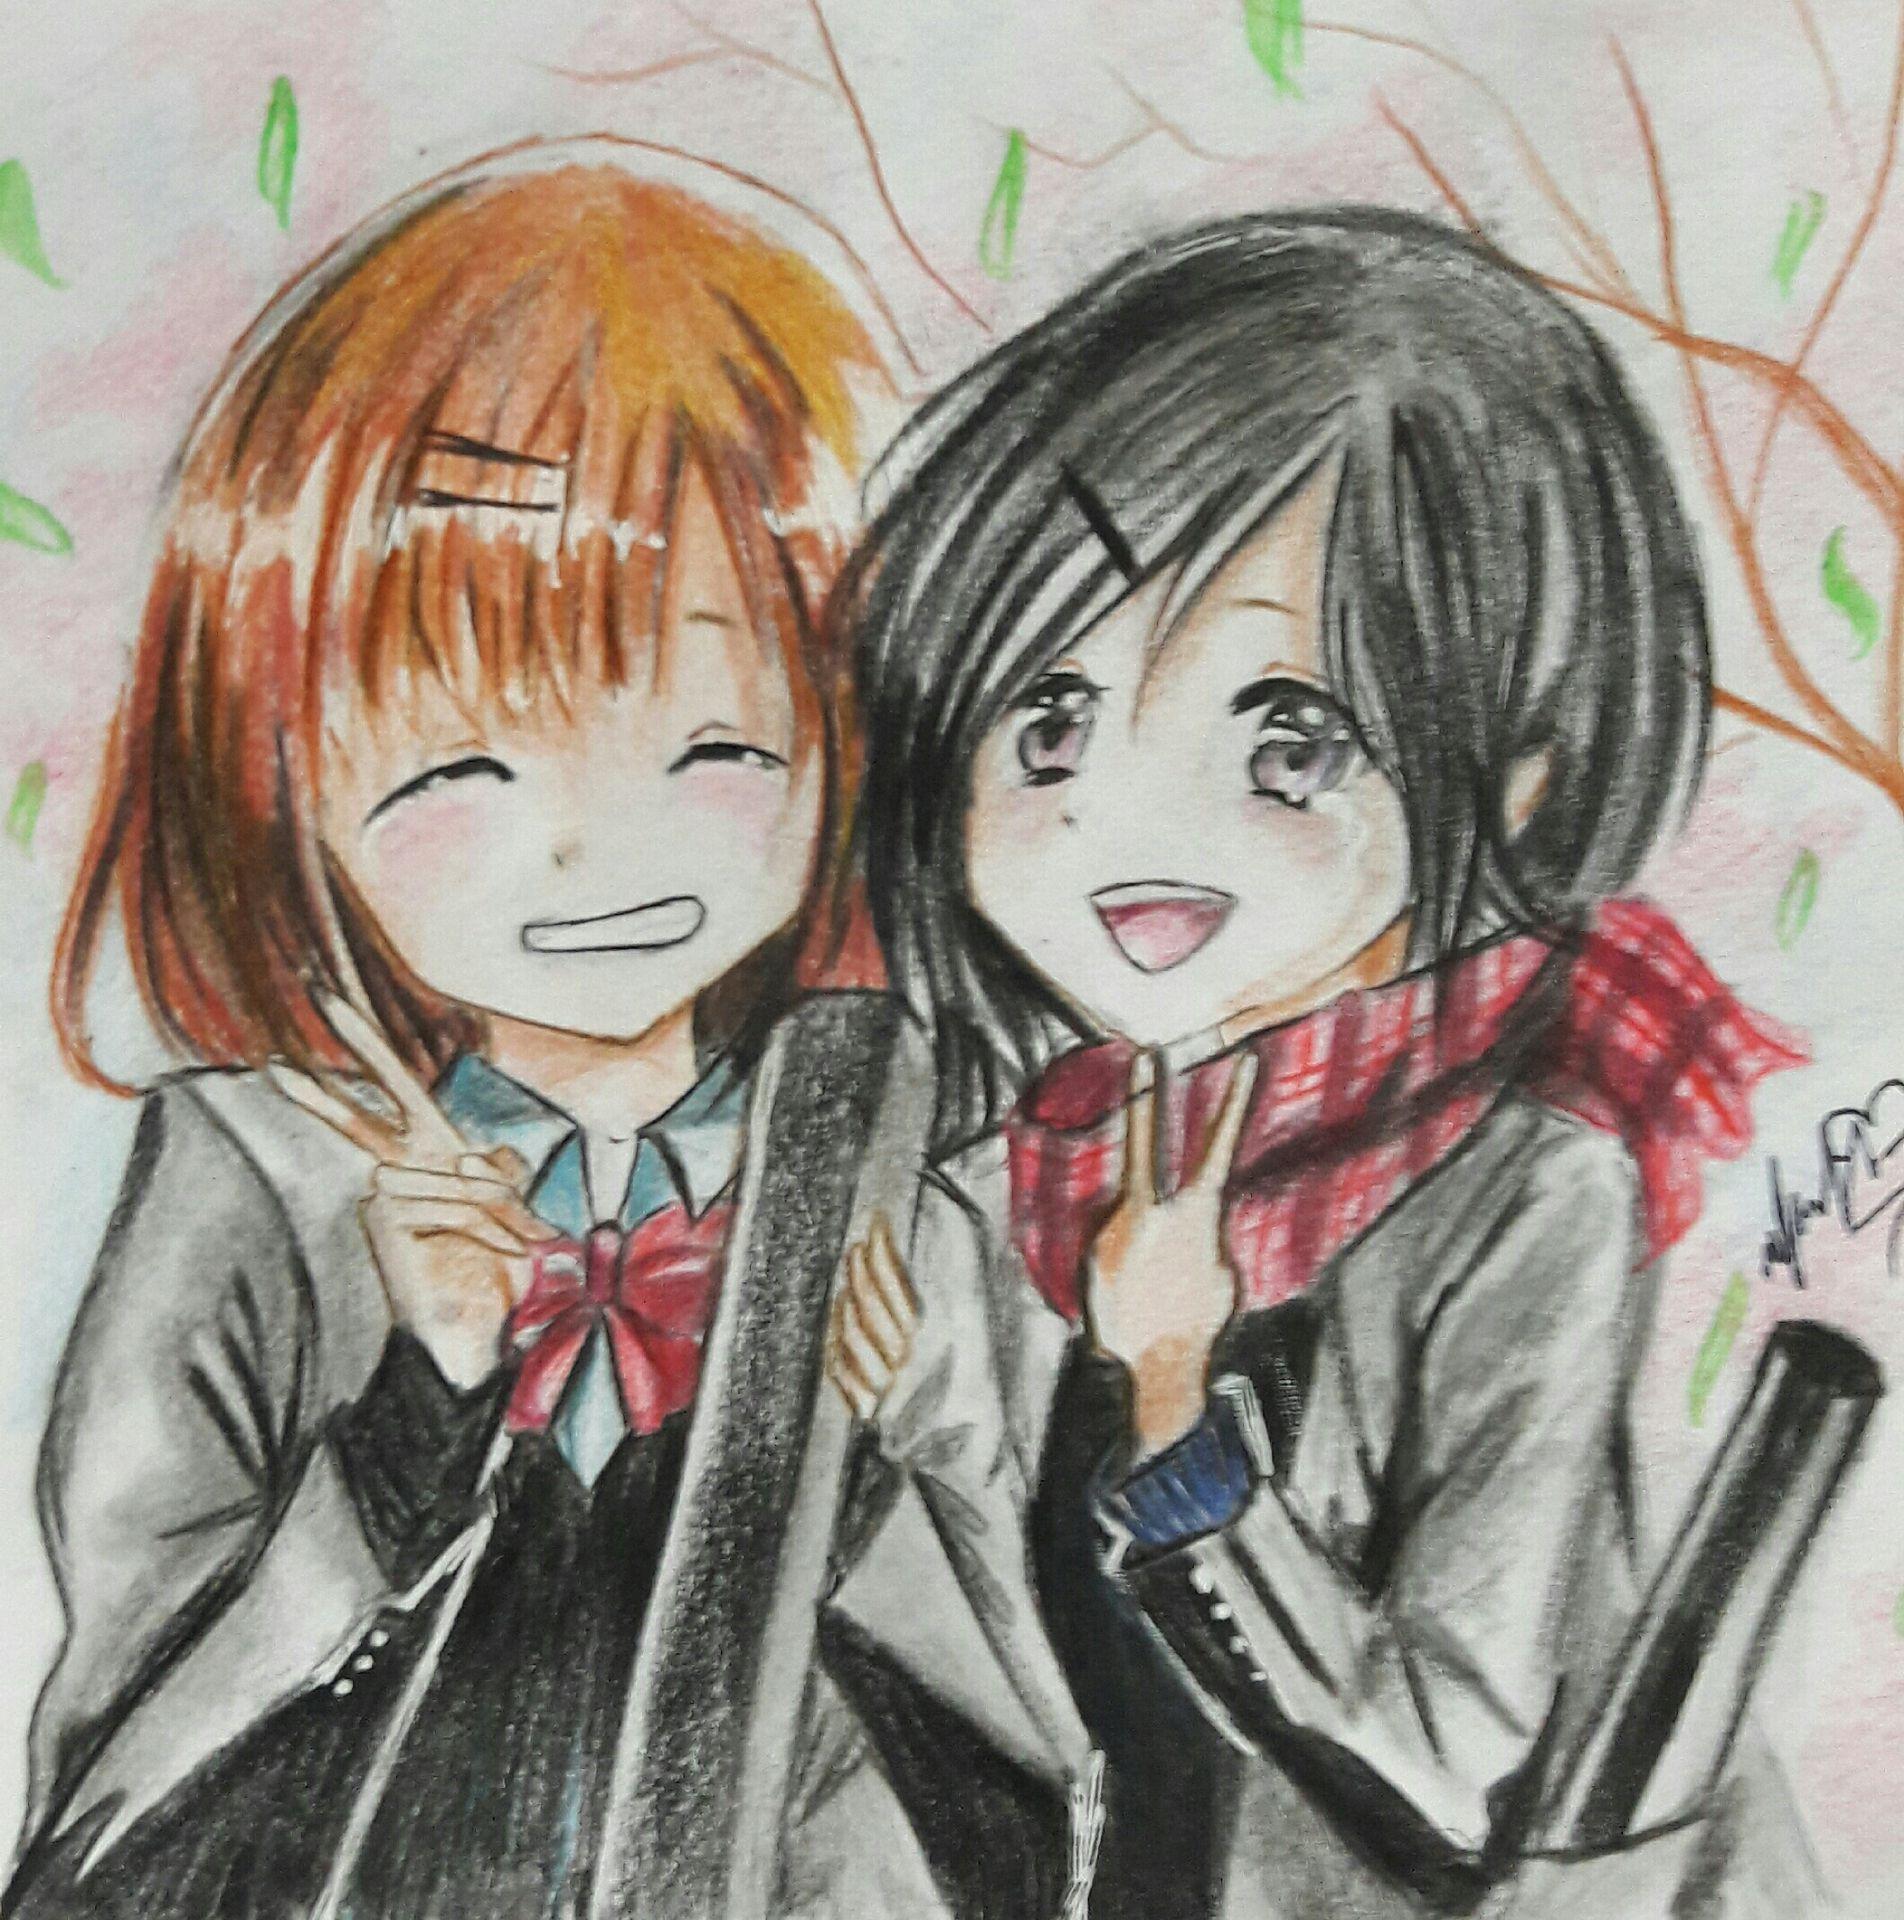 مرحبا هنا سأشارك بمسابقة رسم جديدة ارجو ان تدعموني عشوائي عشوائي Amreading Books Wattpad Art Anime